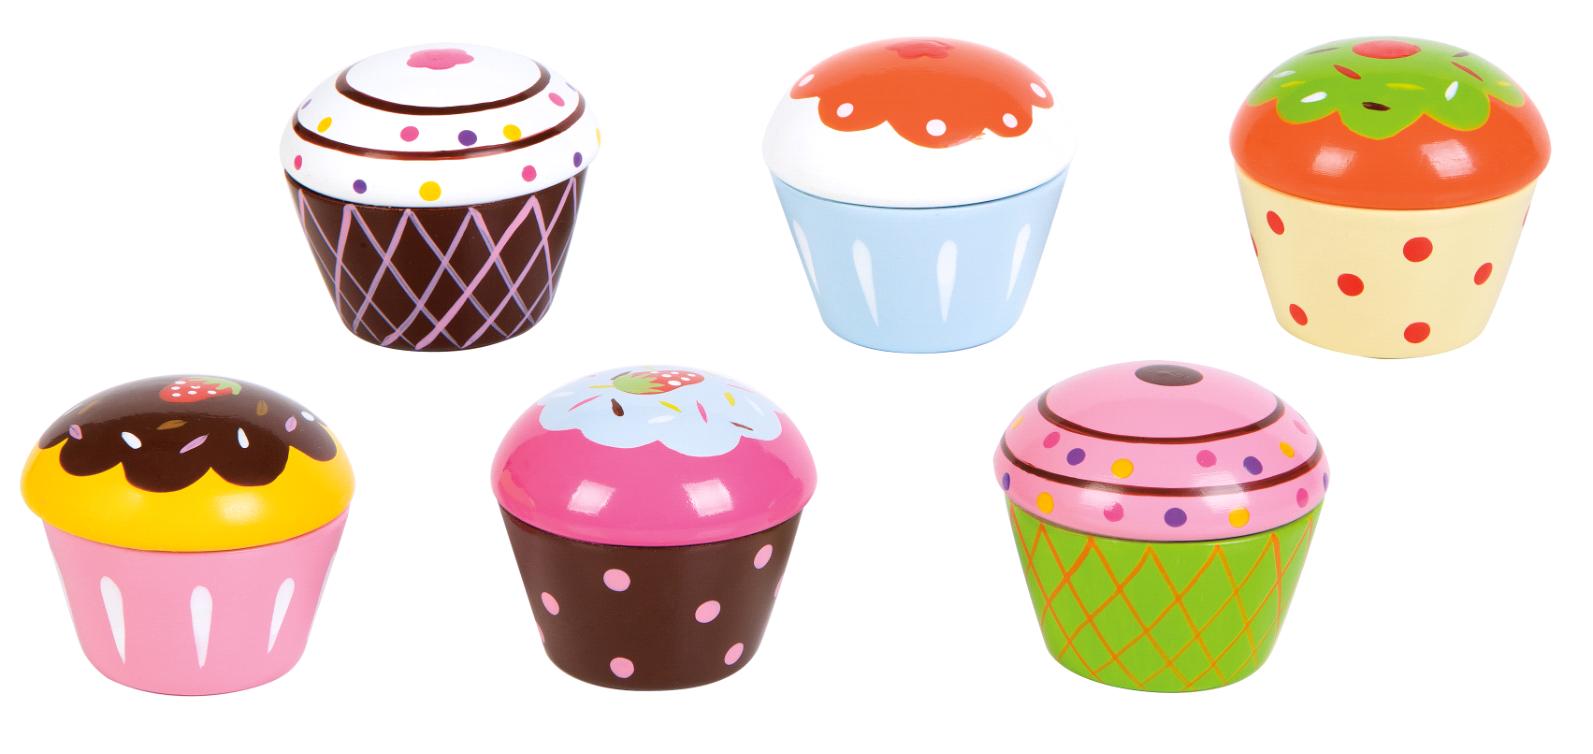 Small Wood - Cupcake Assortment 6Pcs (L40128)